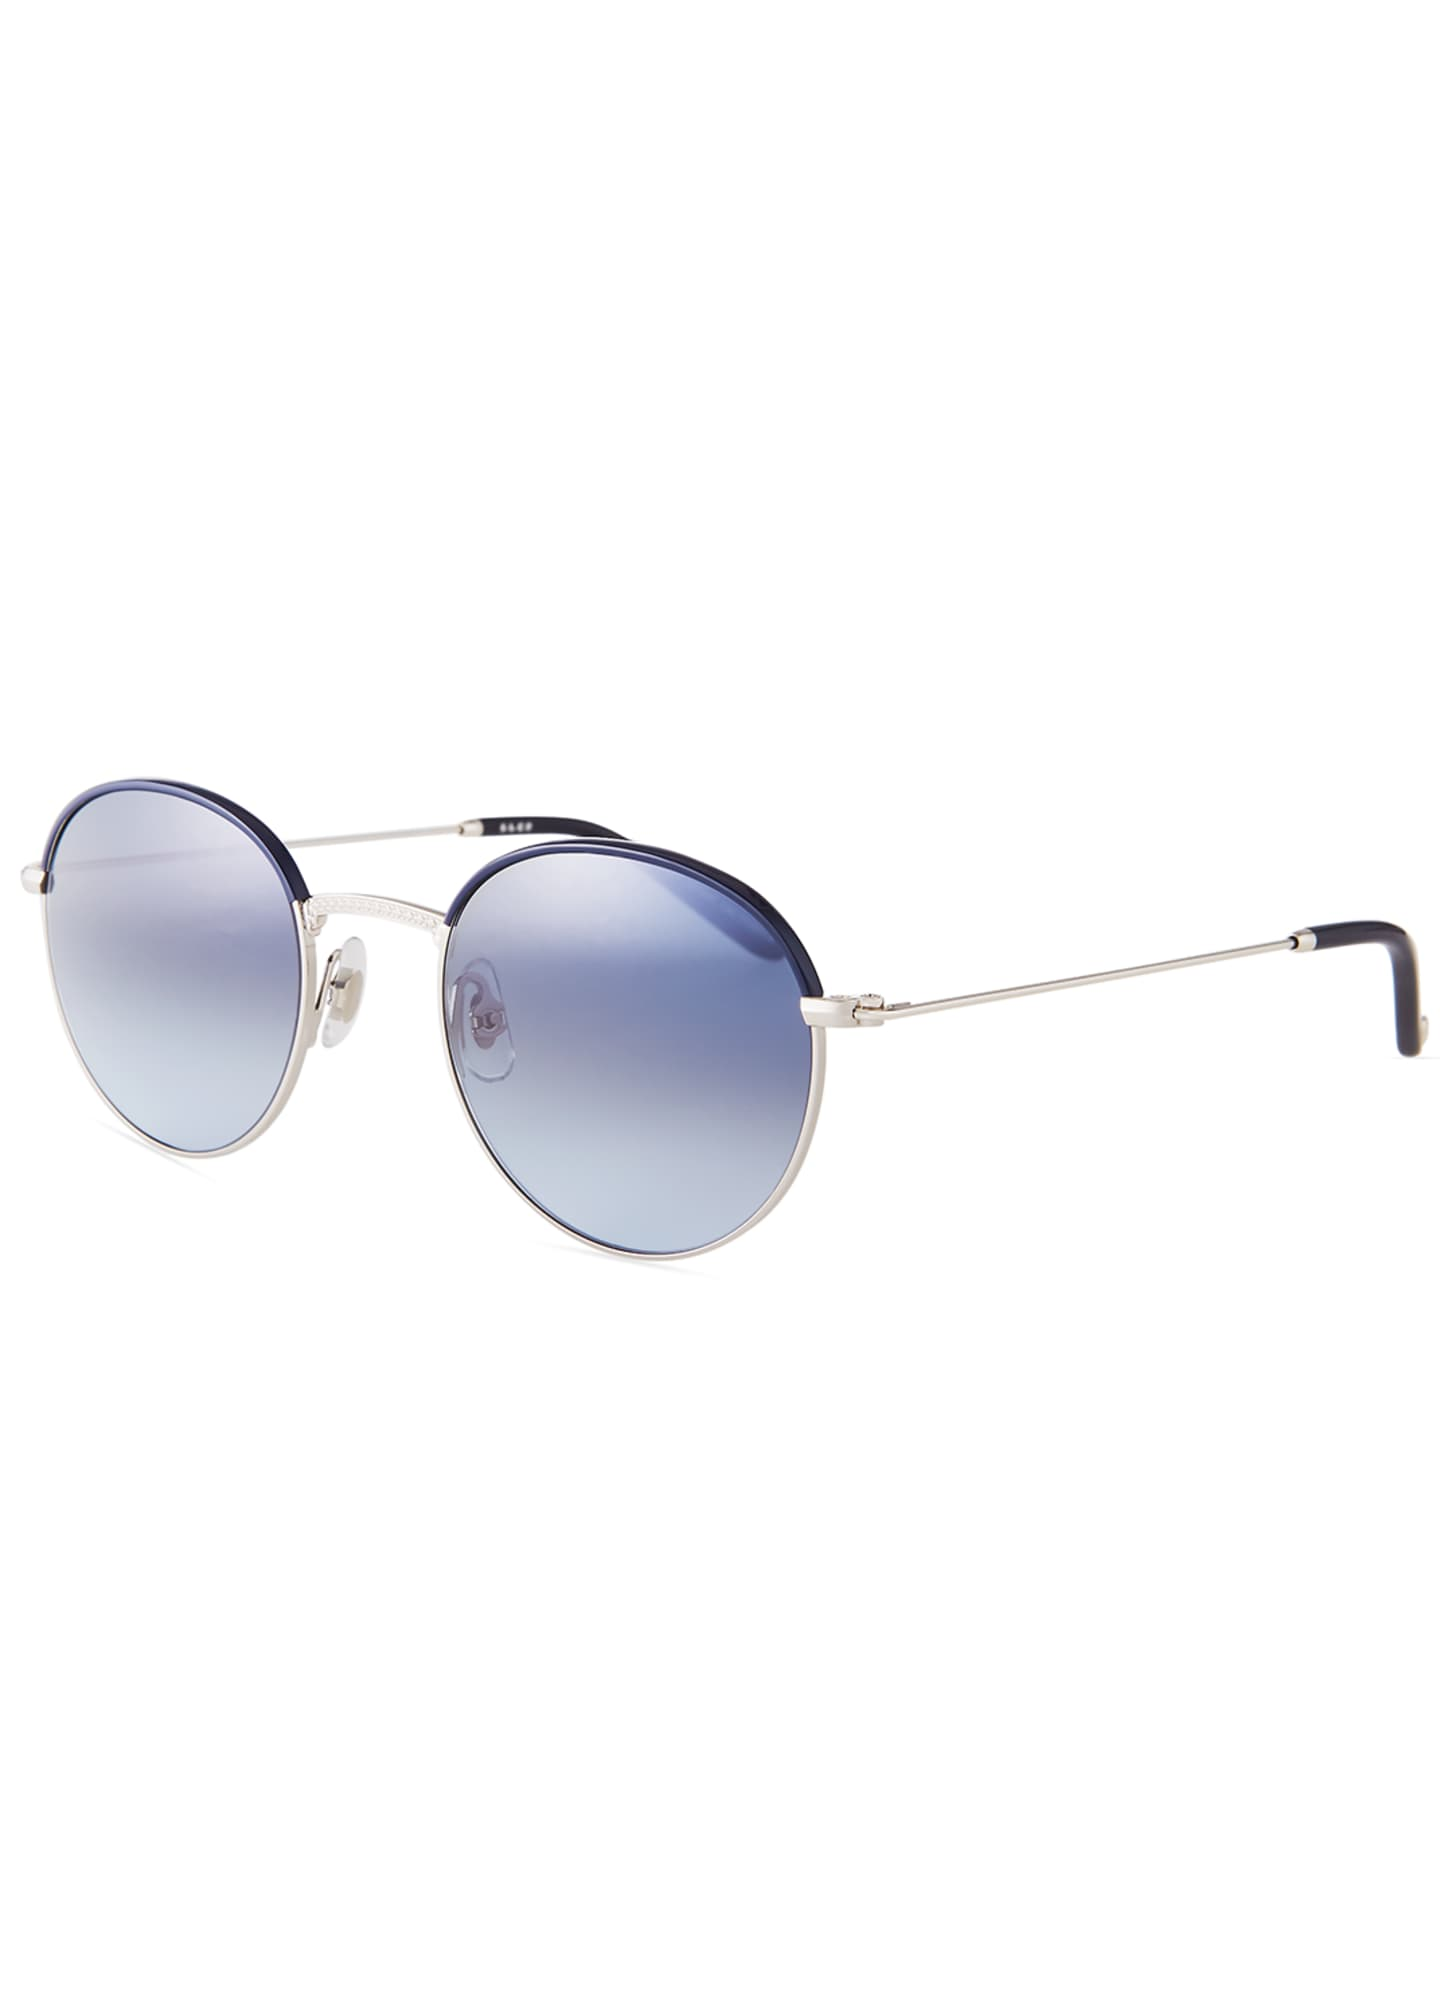 Garrett Leight Cloy Round Stainless Steel Sunglasses w/